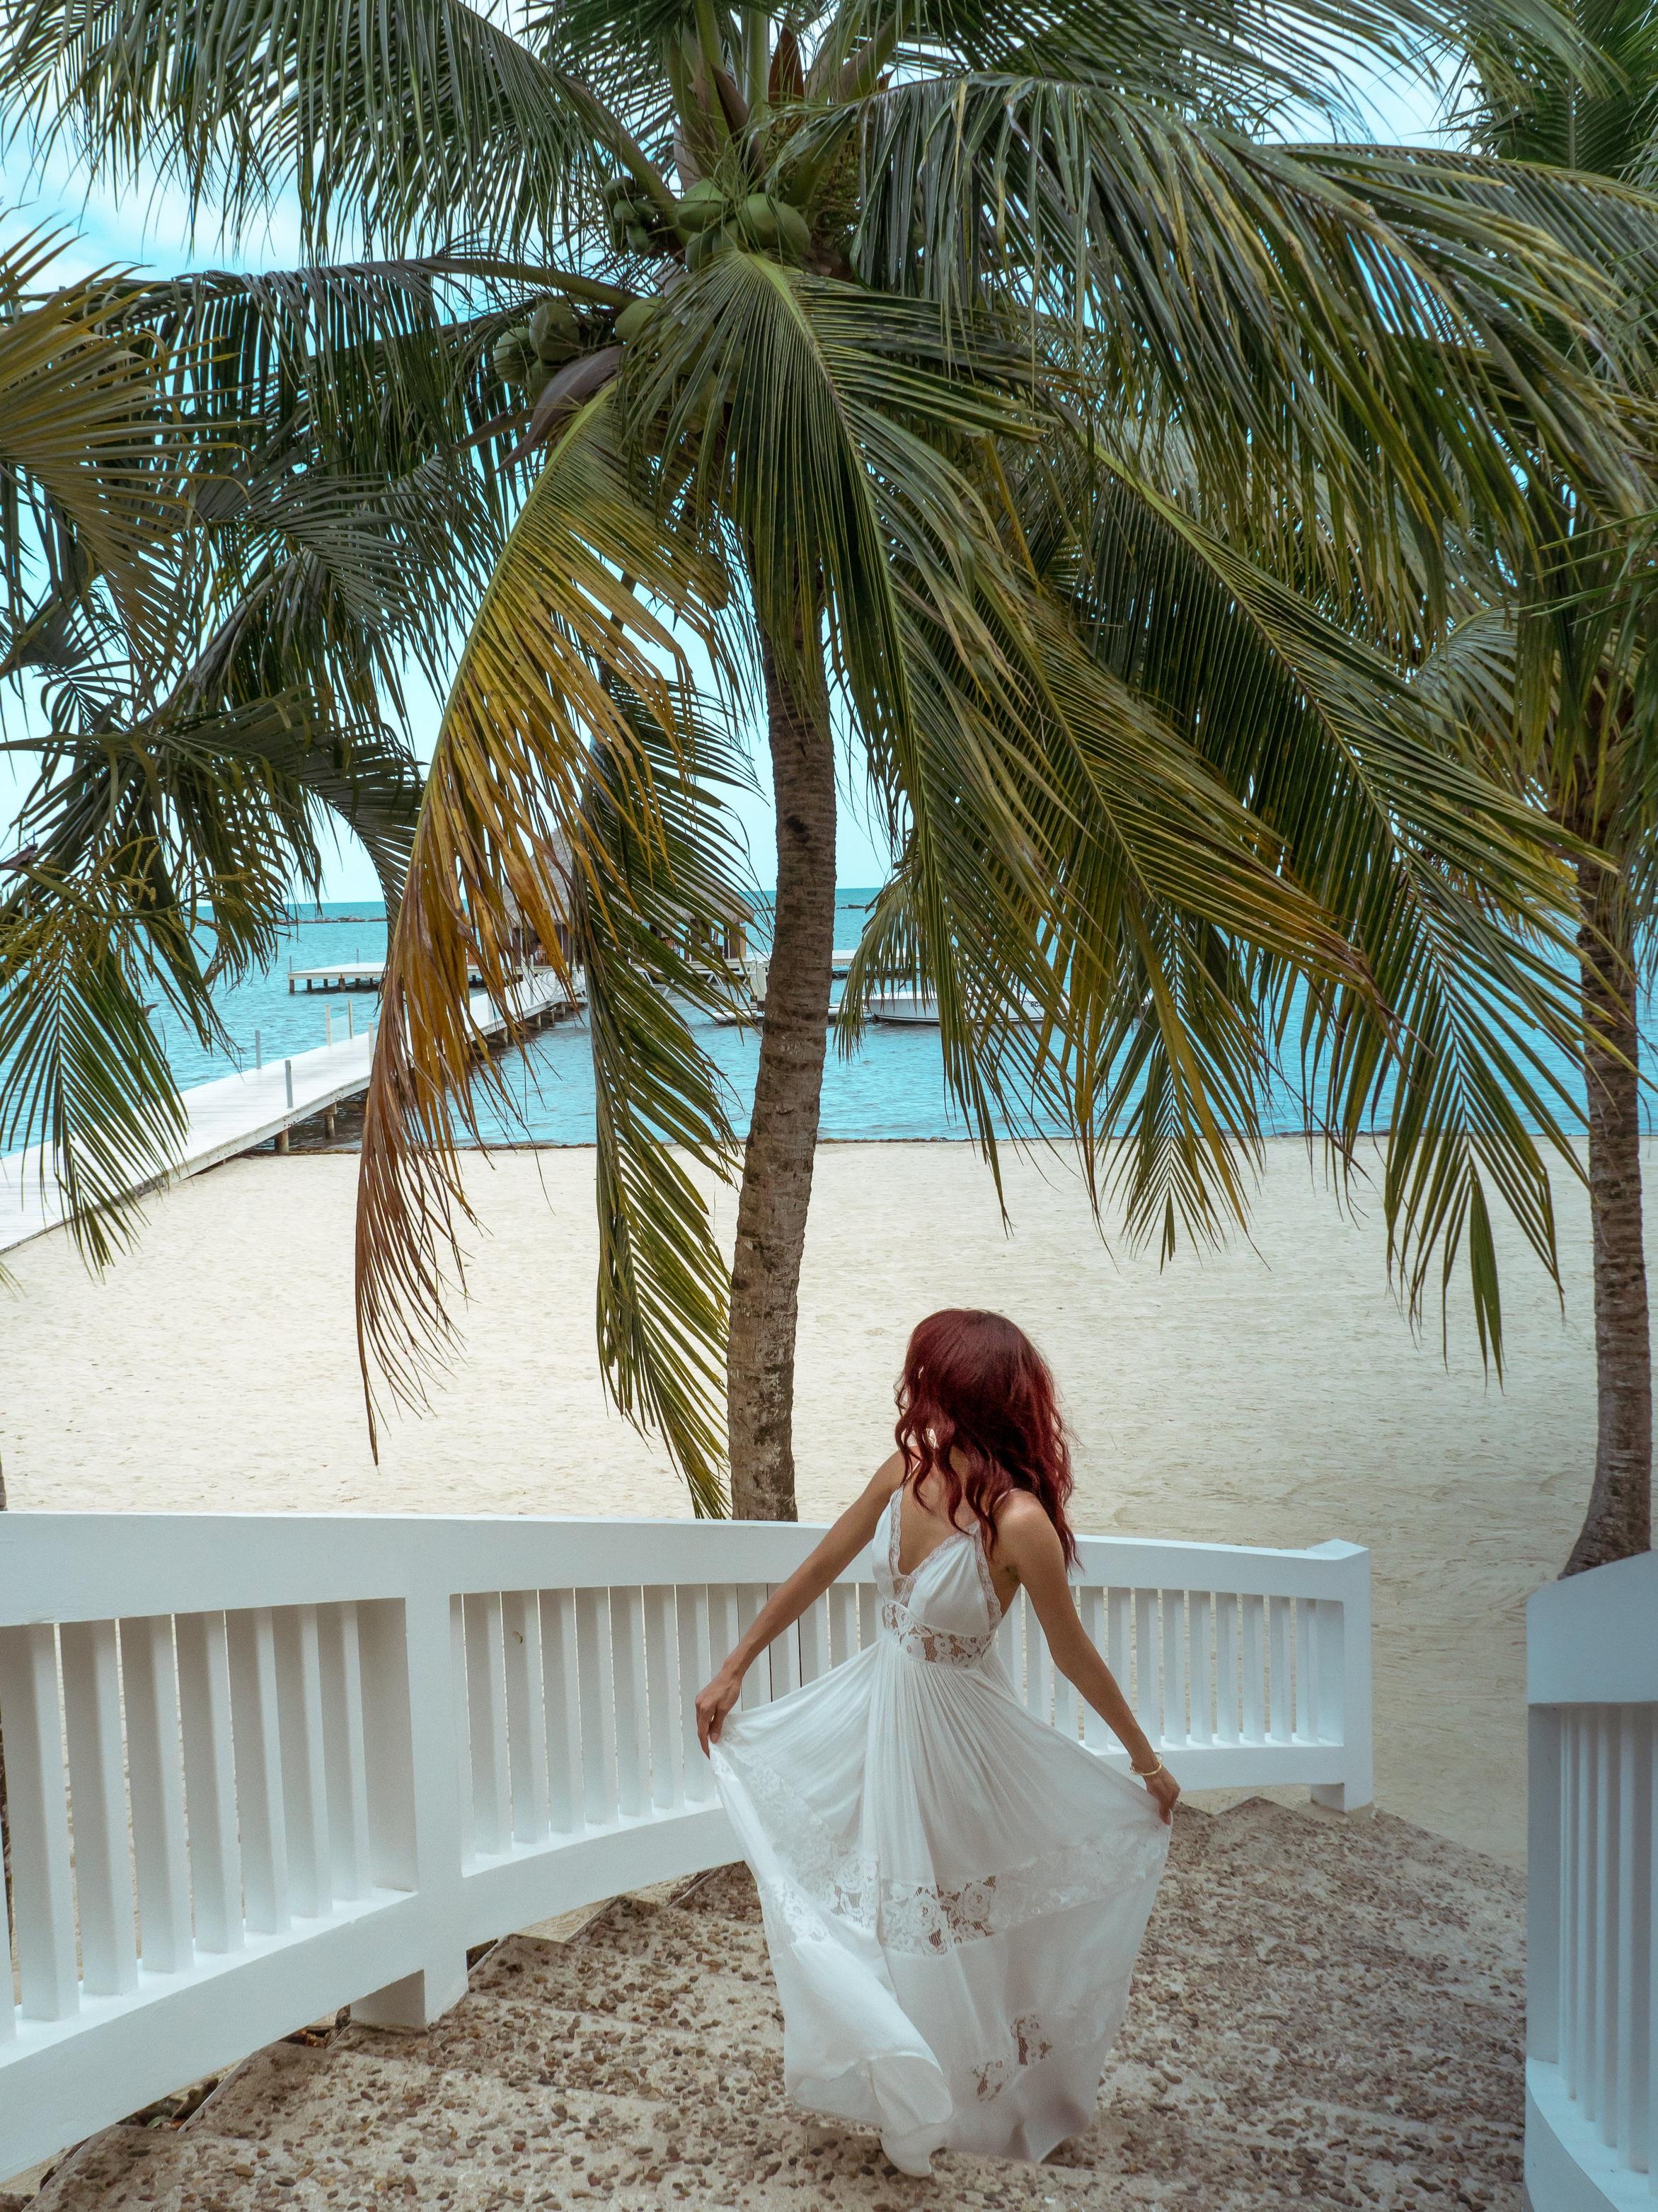 The placencia - Beach Resort